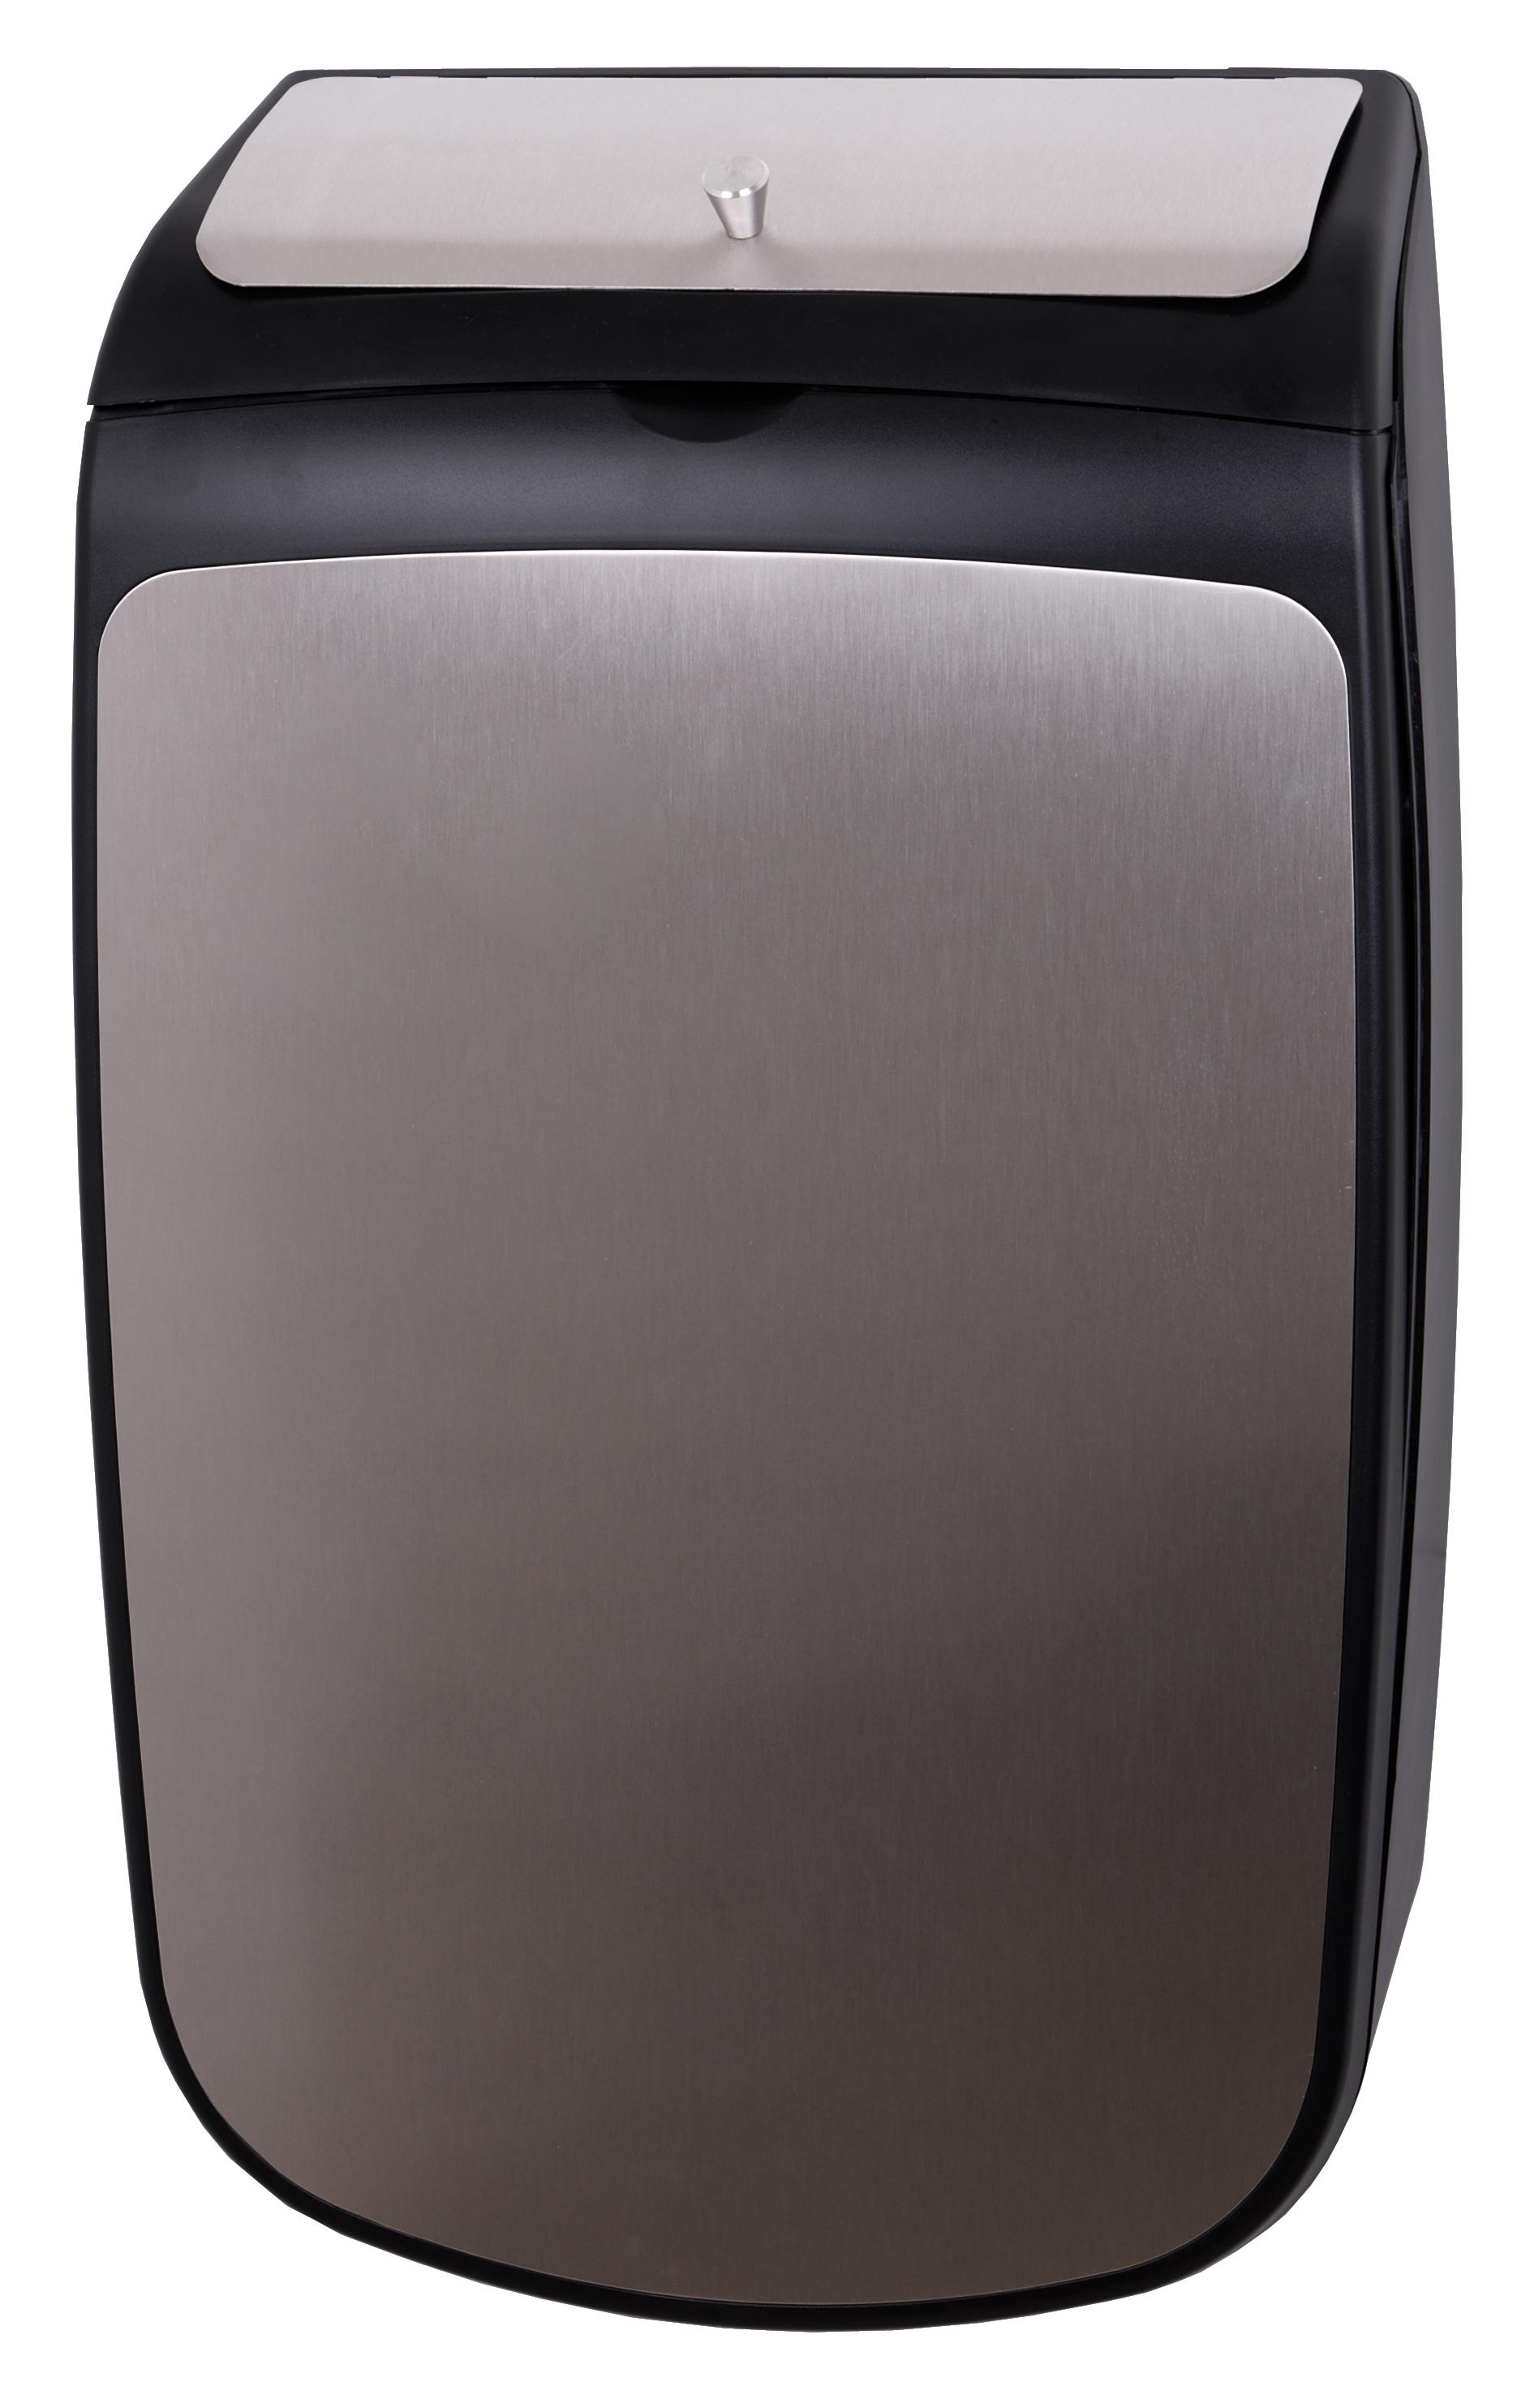 ALL CARE Dispenserline - Hygienebak 25 liter PLE